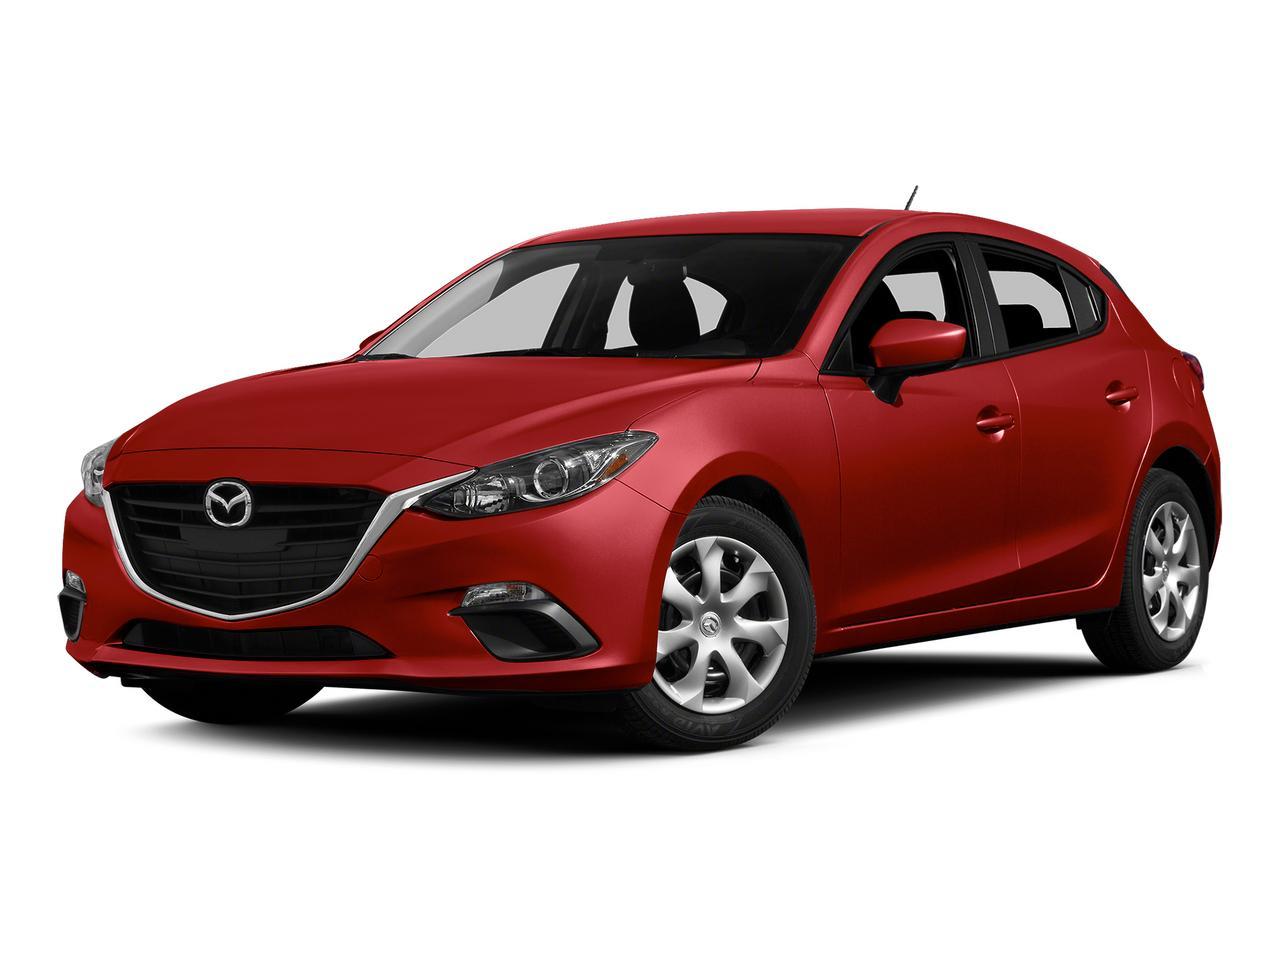 2015 Mazda Mazda3 Vehicle Photo in Corpus Christi, TX 78410-4506